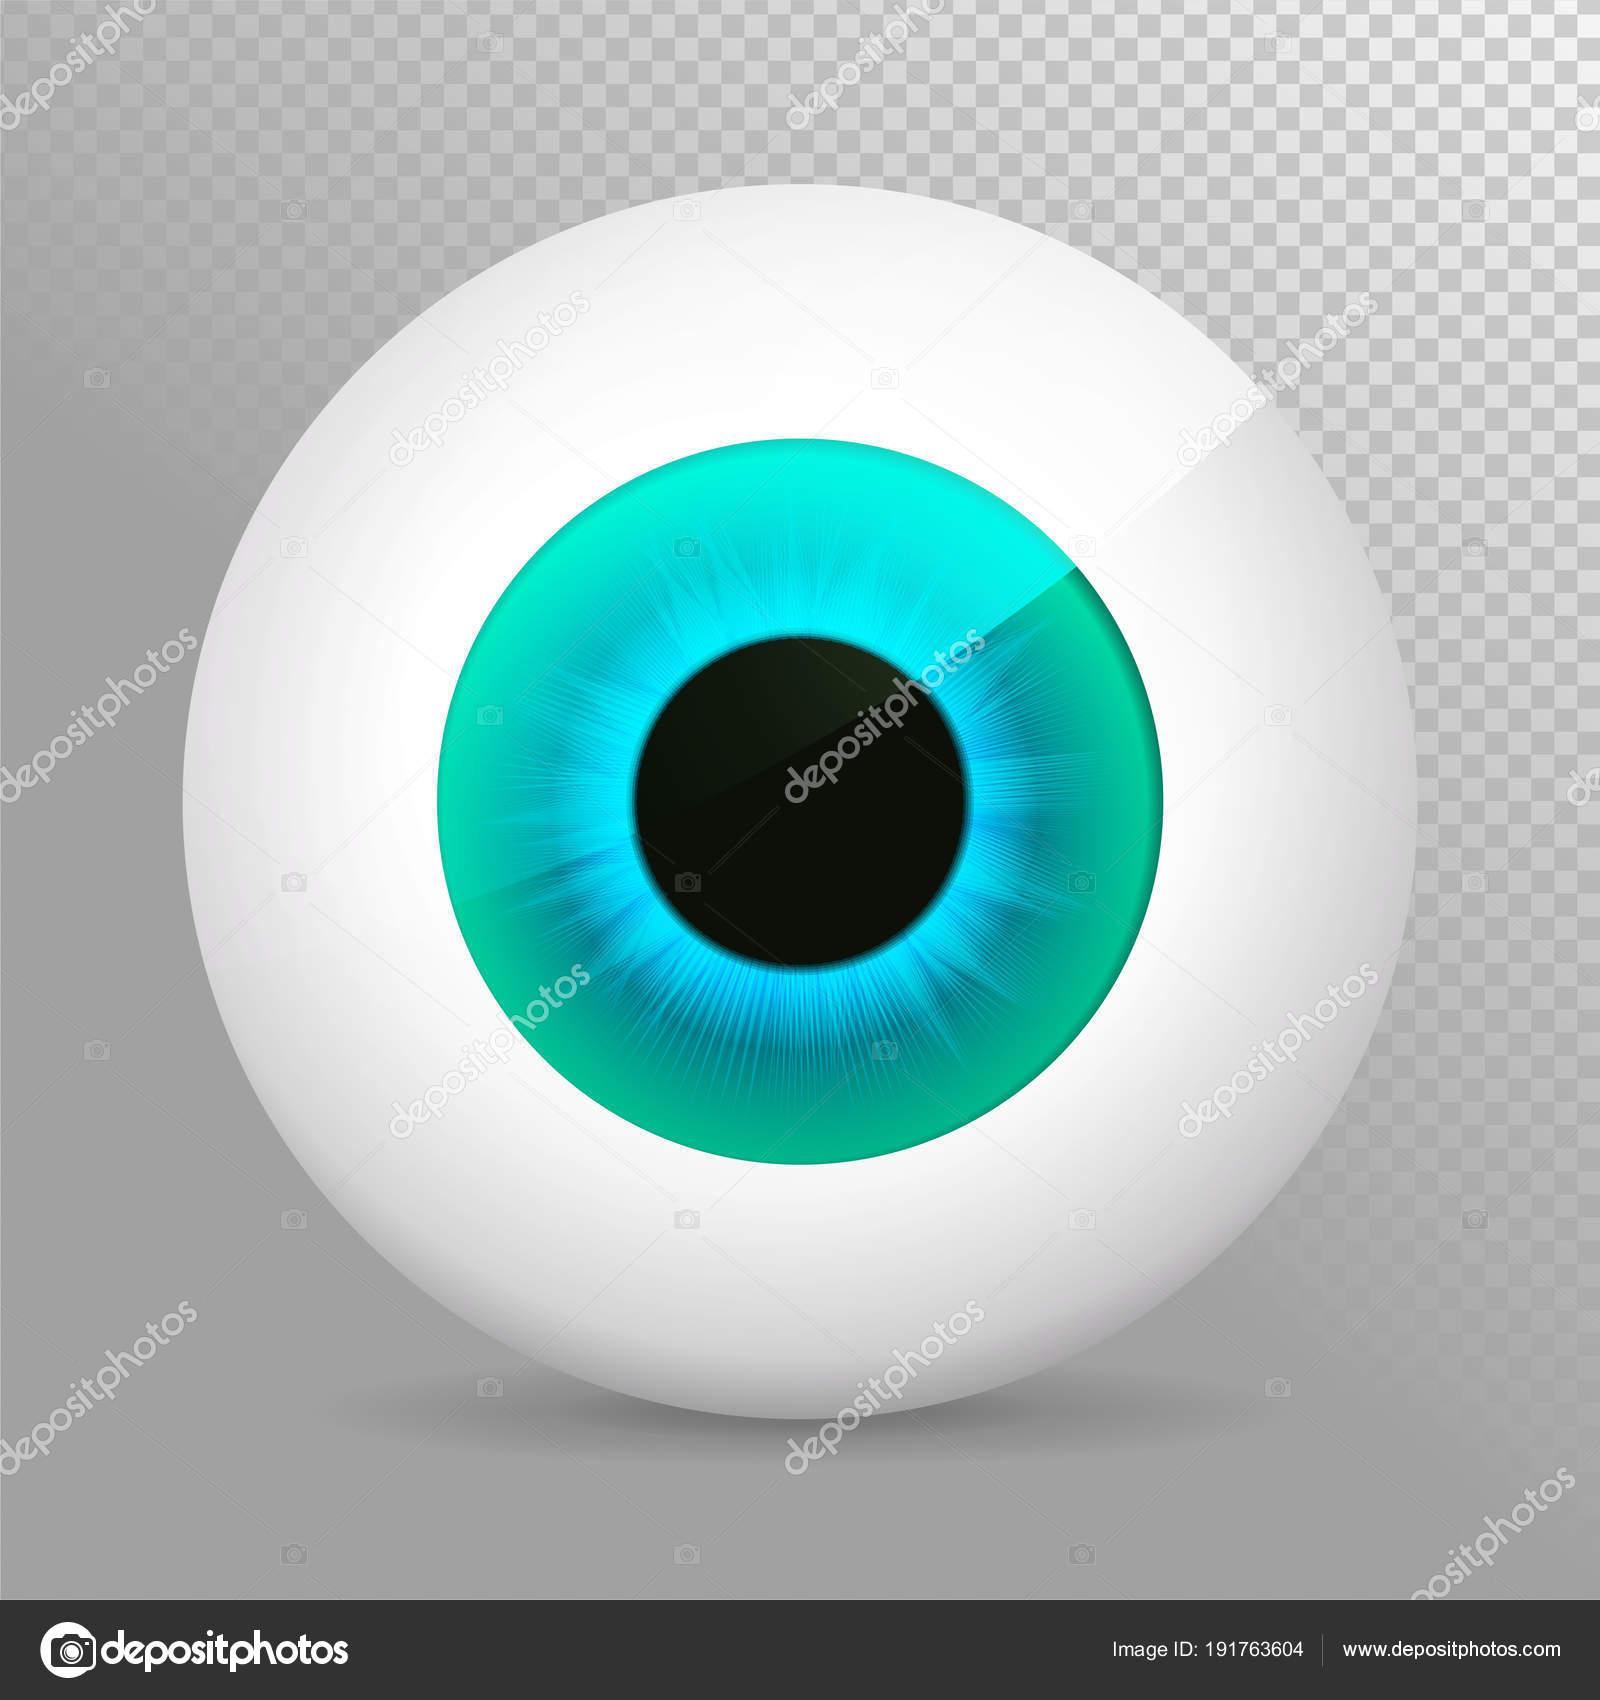 Ojo, azul. Globo ocular azul 3d realista vector ilustración. Esfera ...